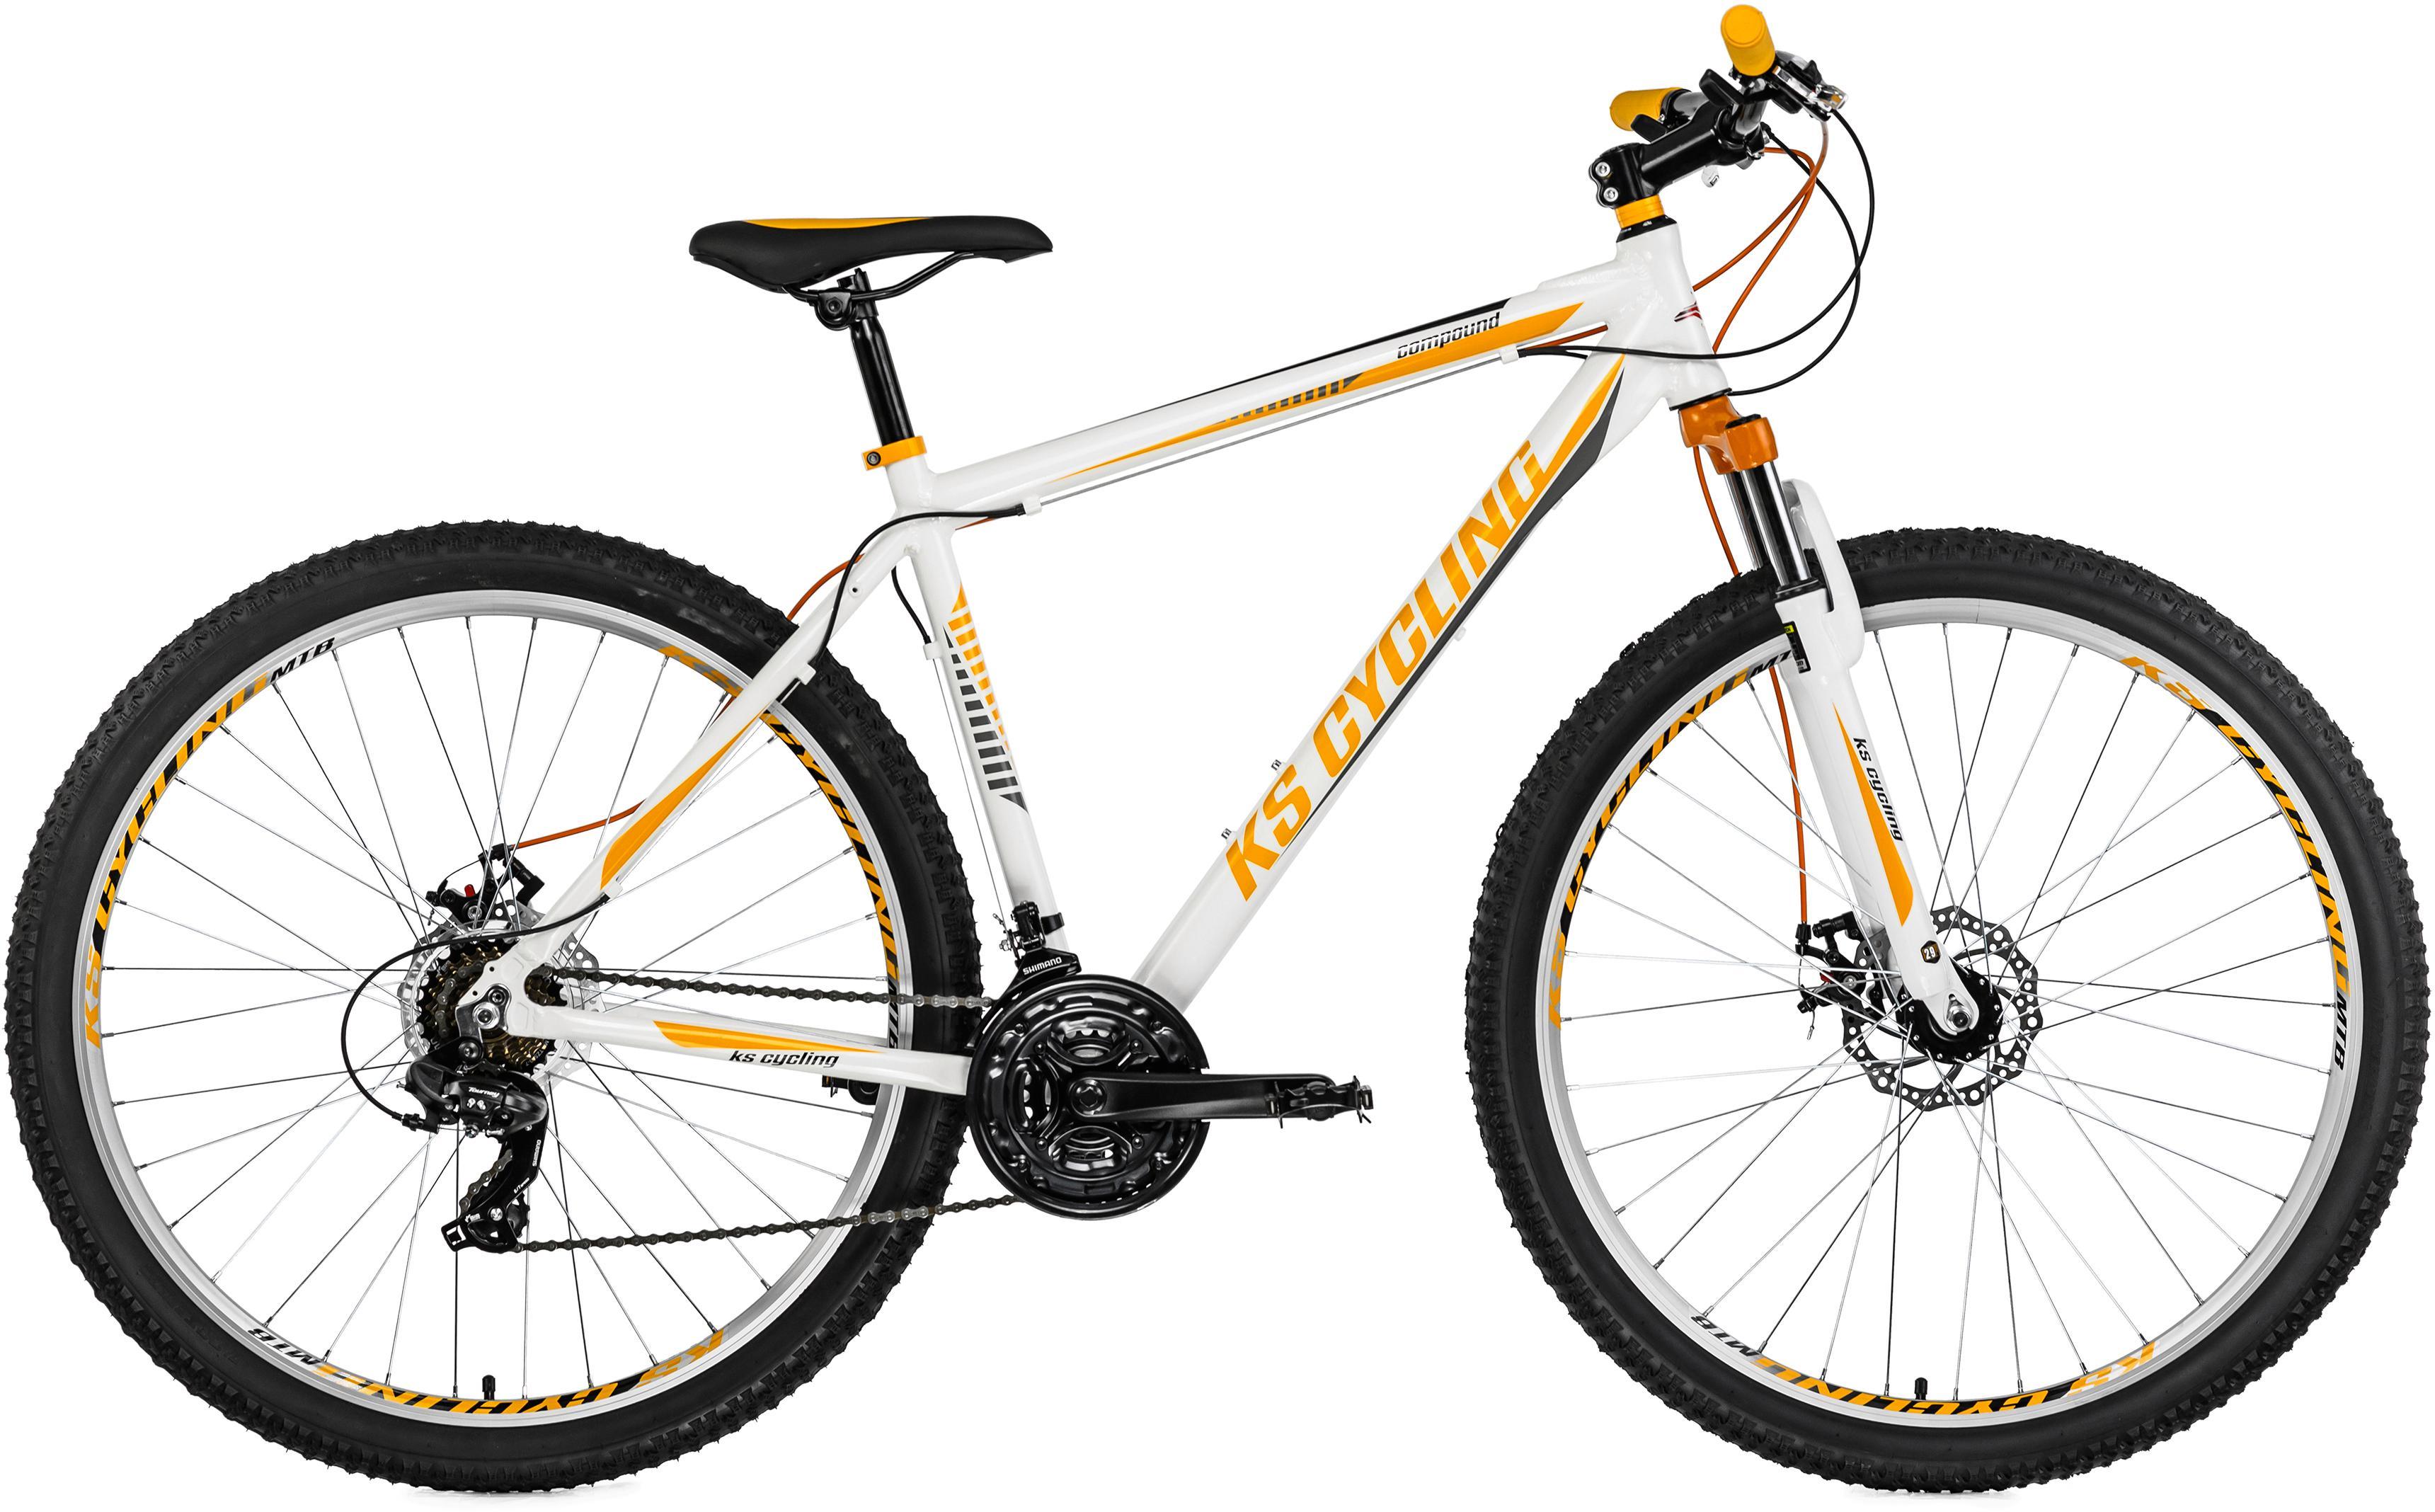 ks cycling mountainbike compound 21 gang shimano. Black Bedroom Furniture Sets. Home Design Ideas